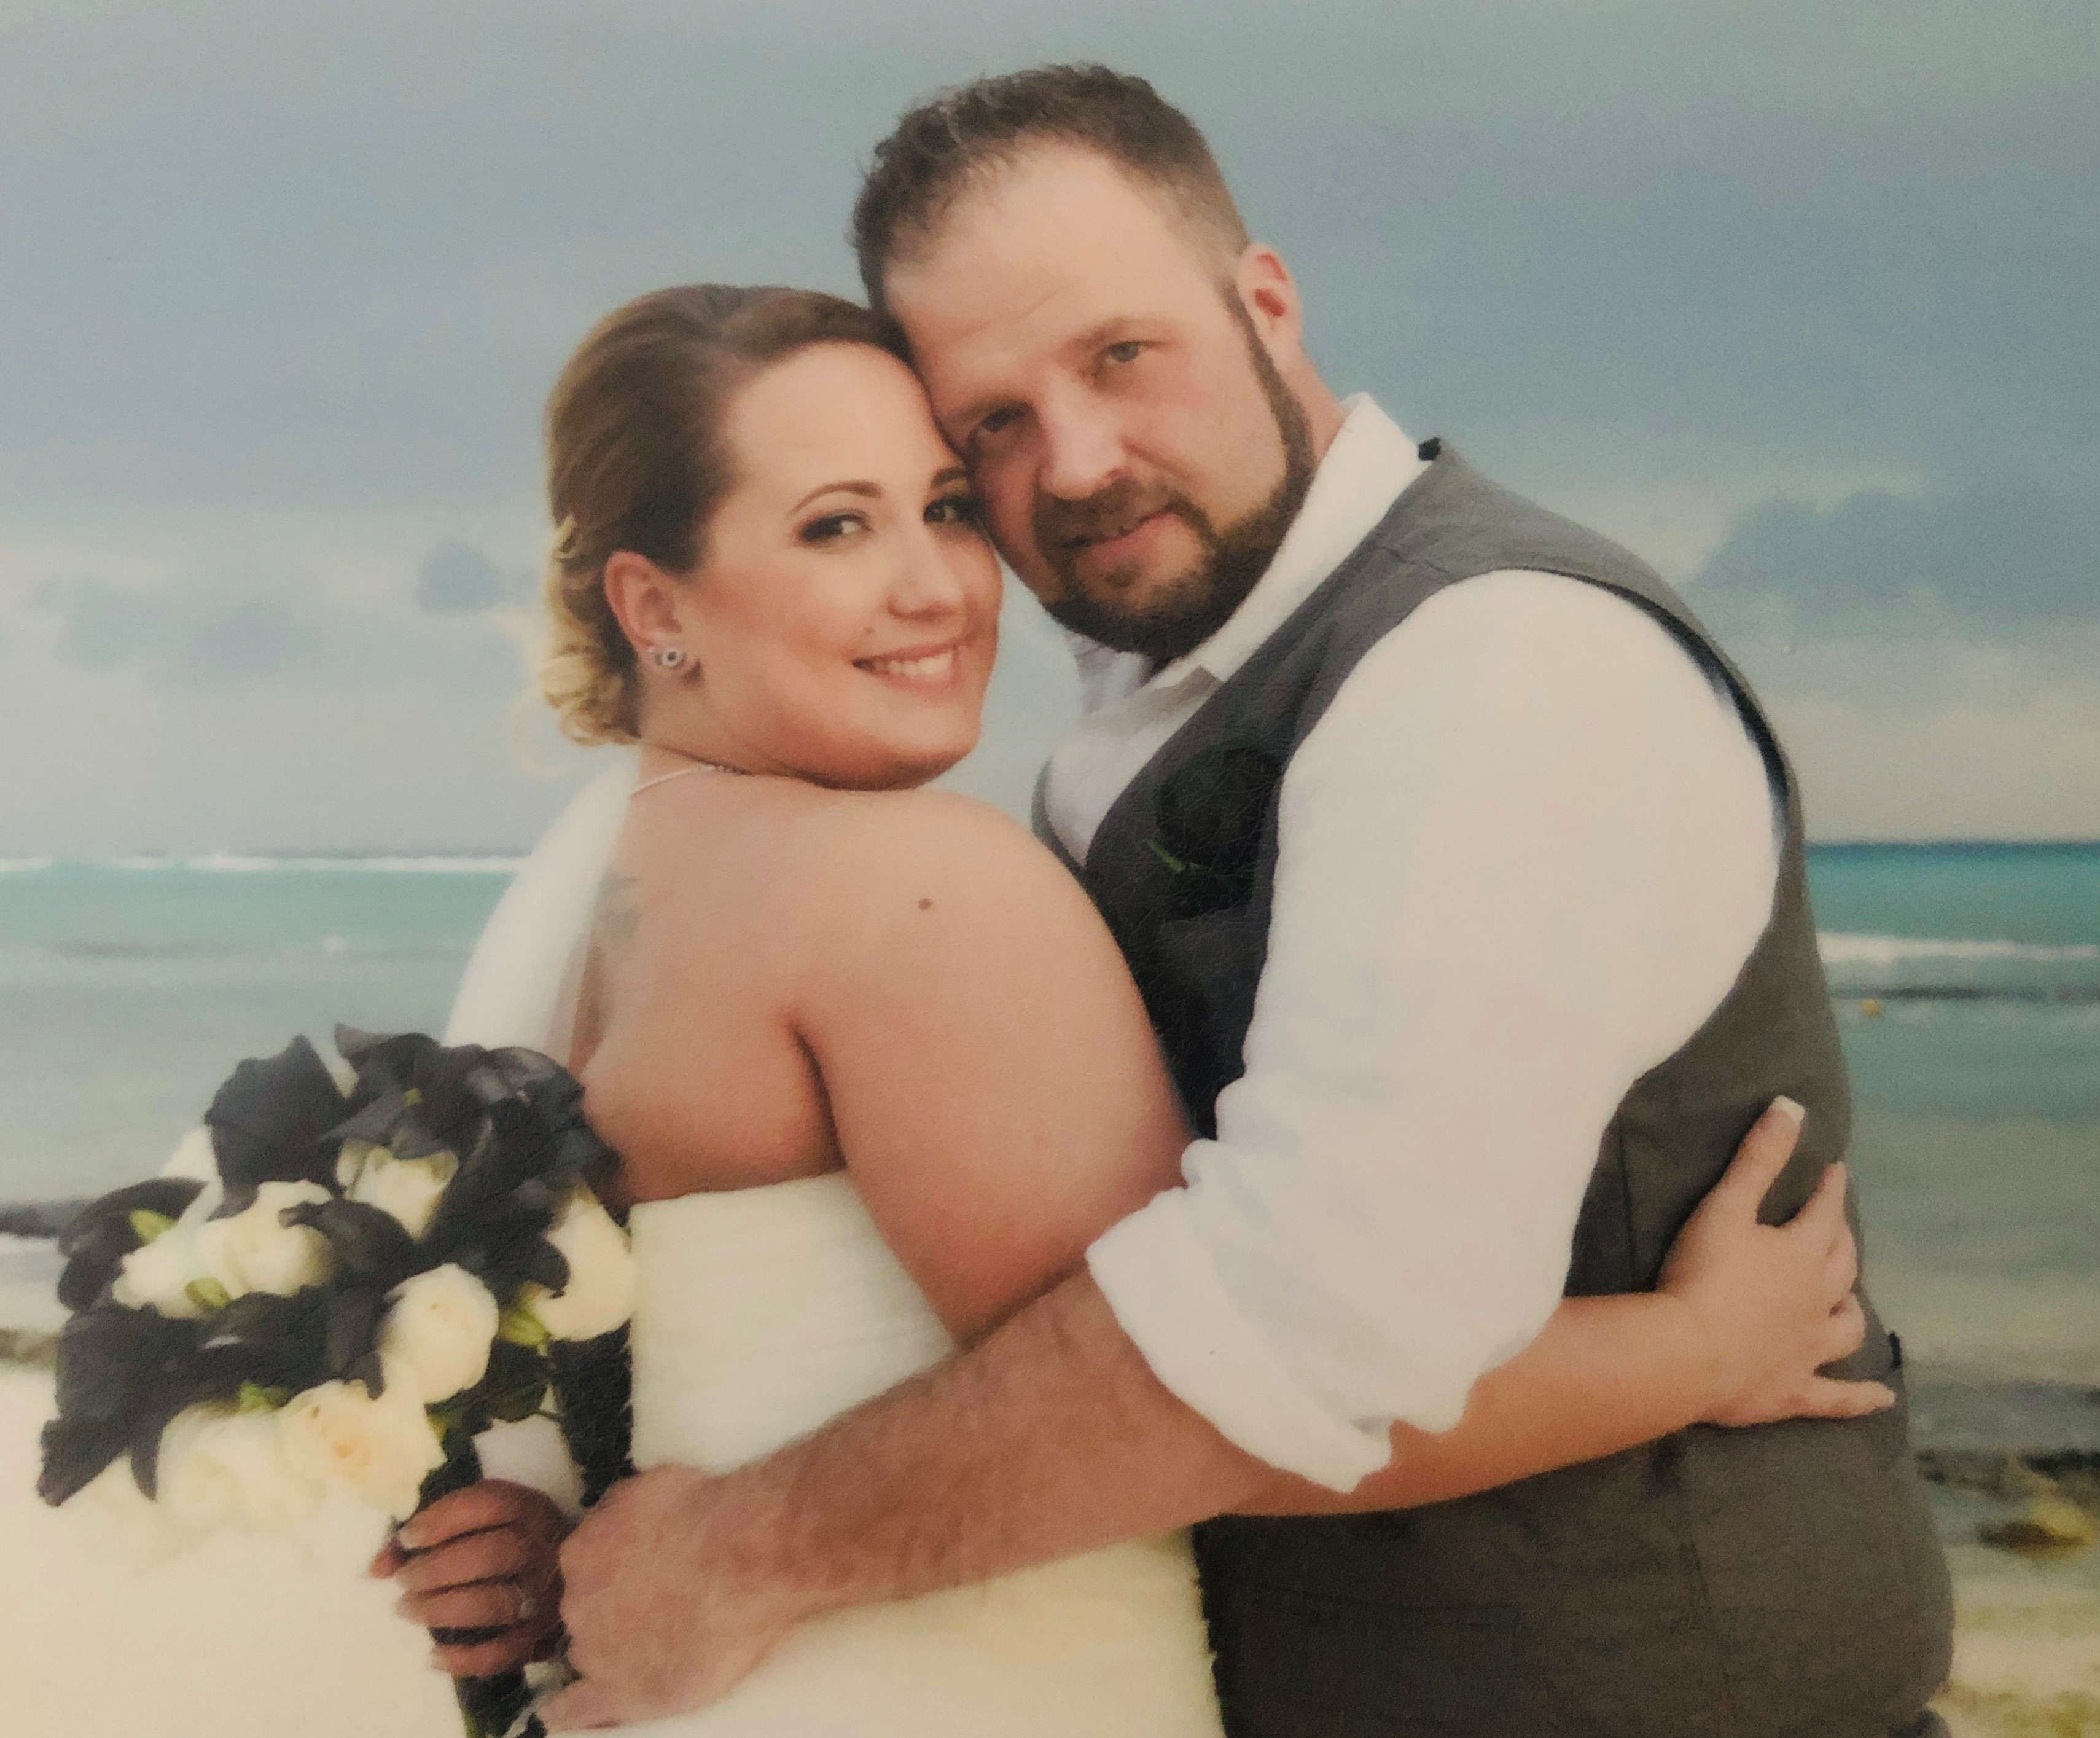 Megan M. Allen-Burgess and Jason Michael Burgess